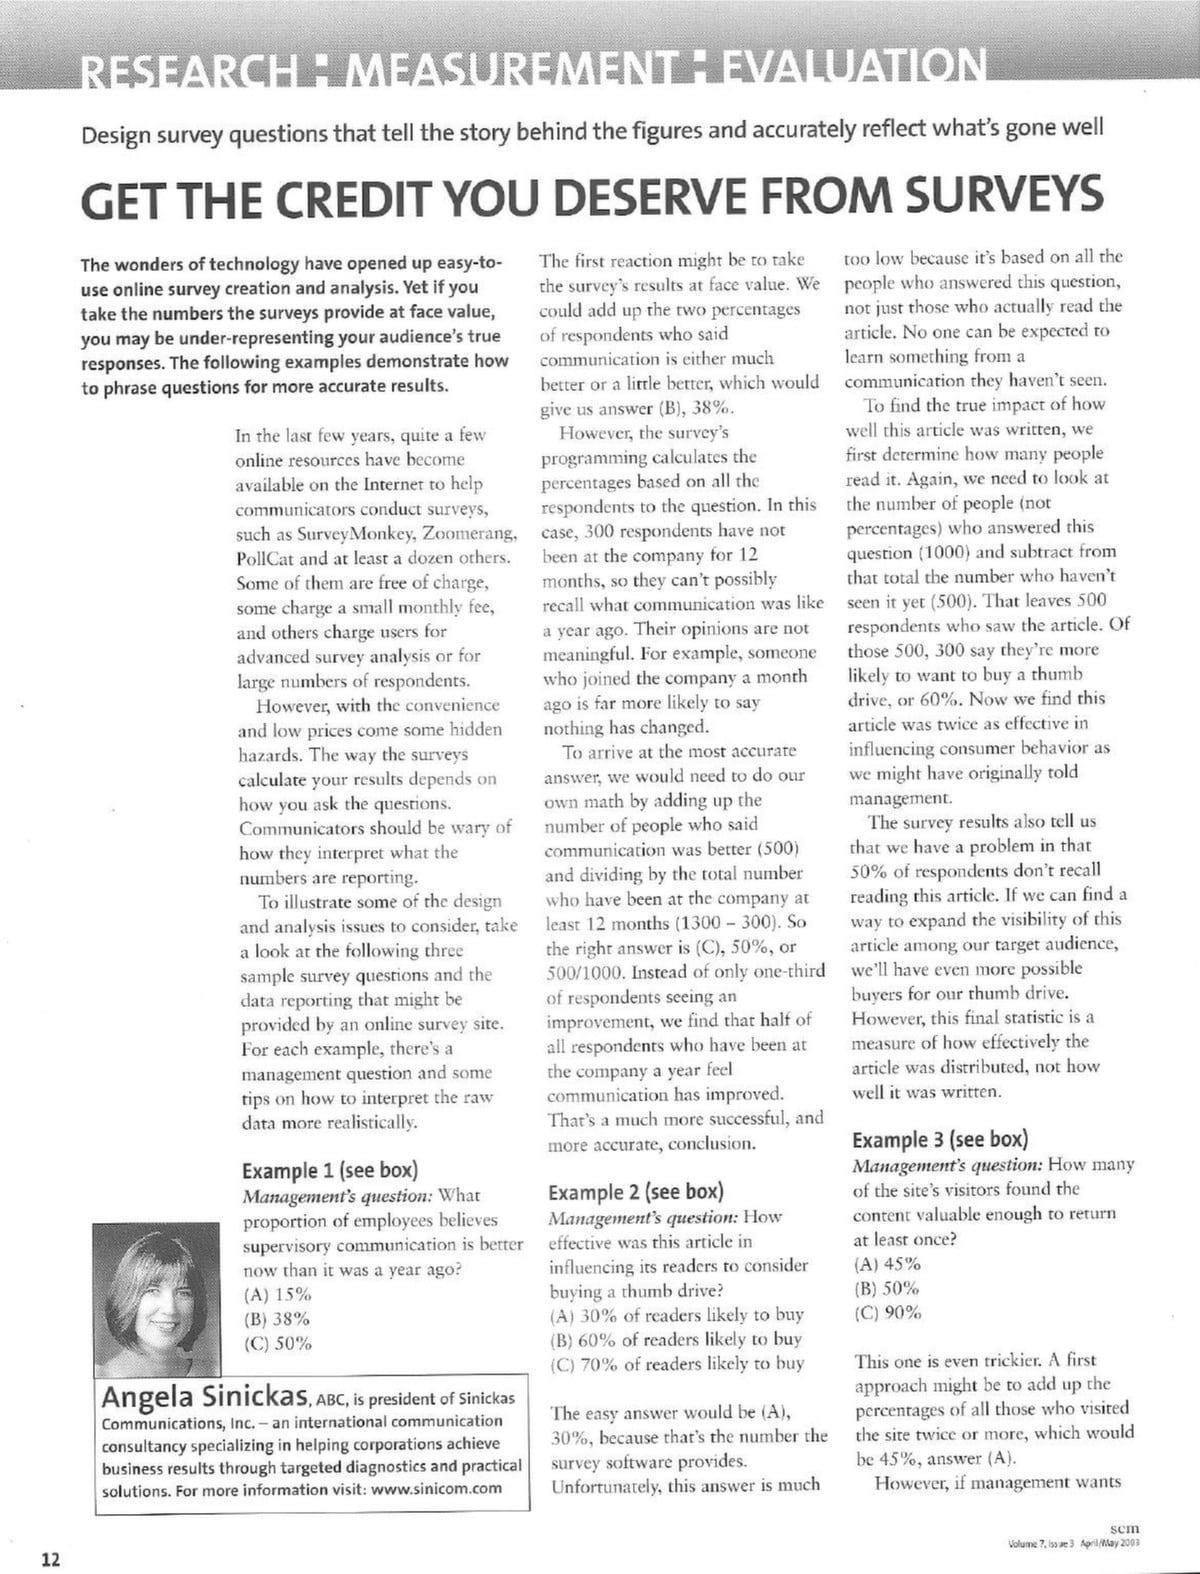 get the credit you deserve from surveys sinickas communications inc